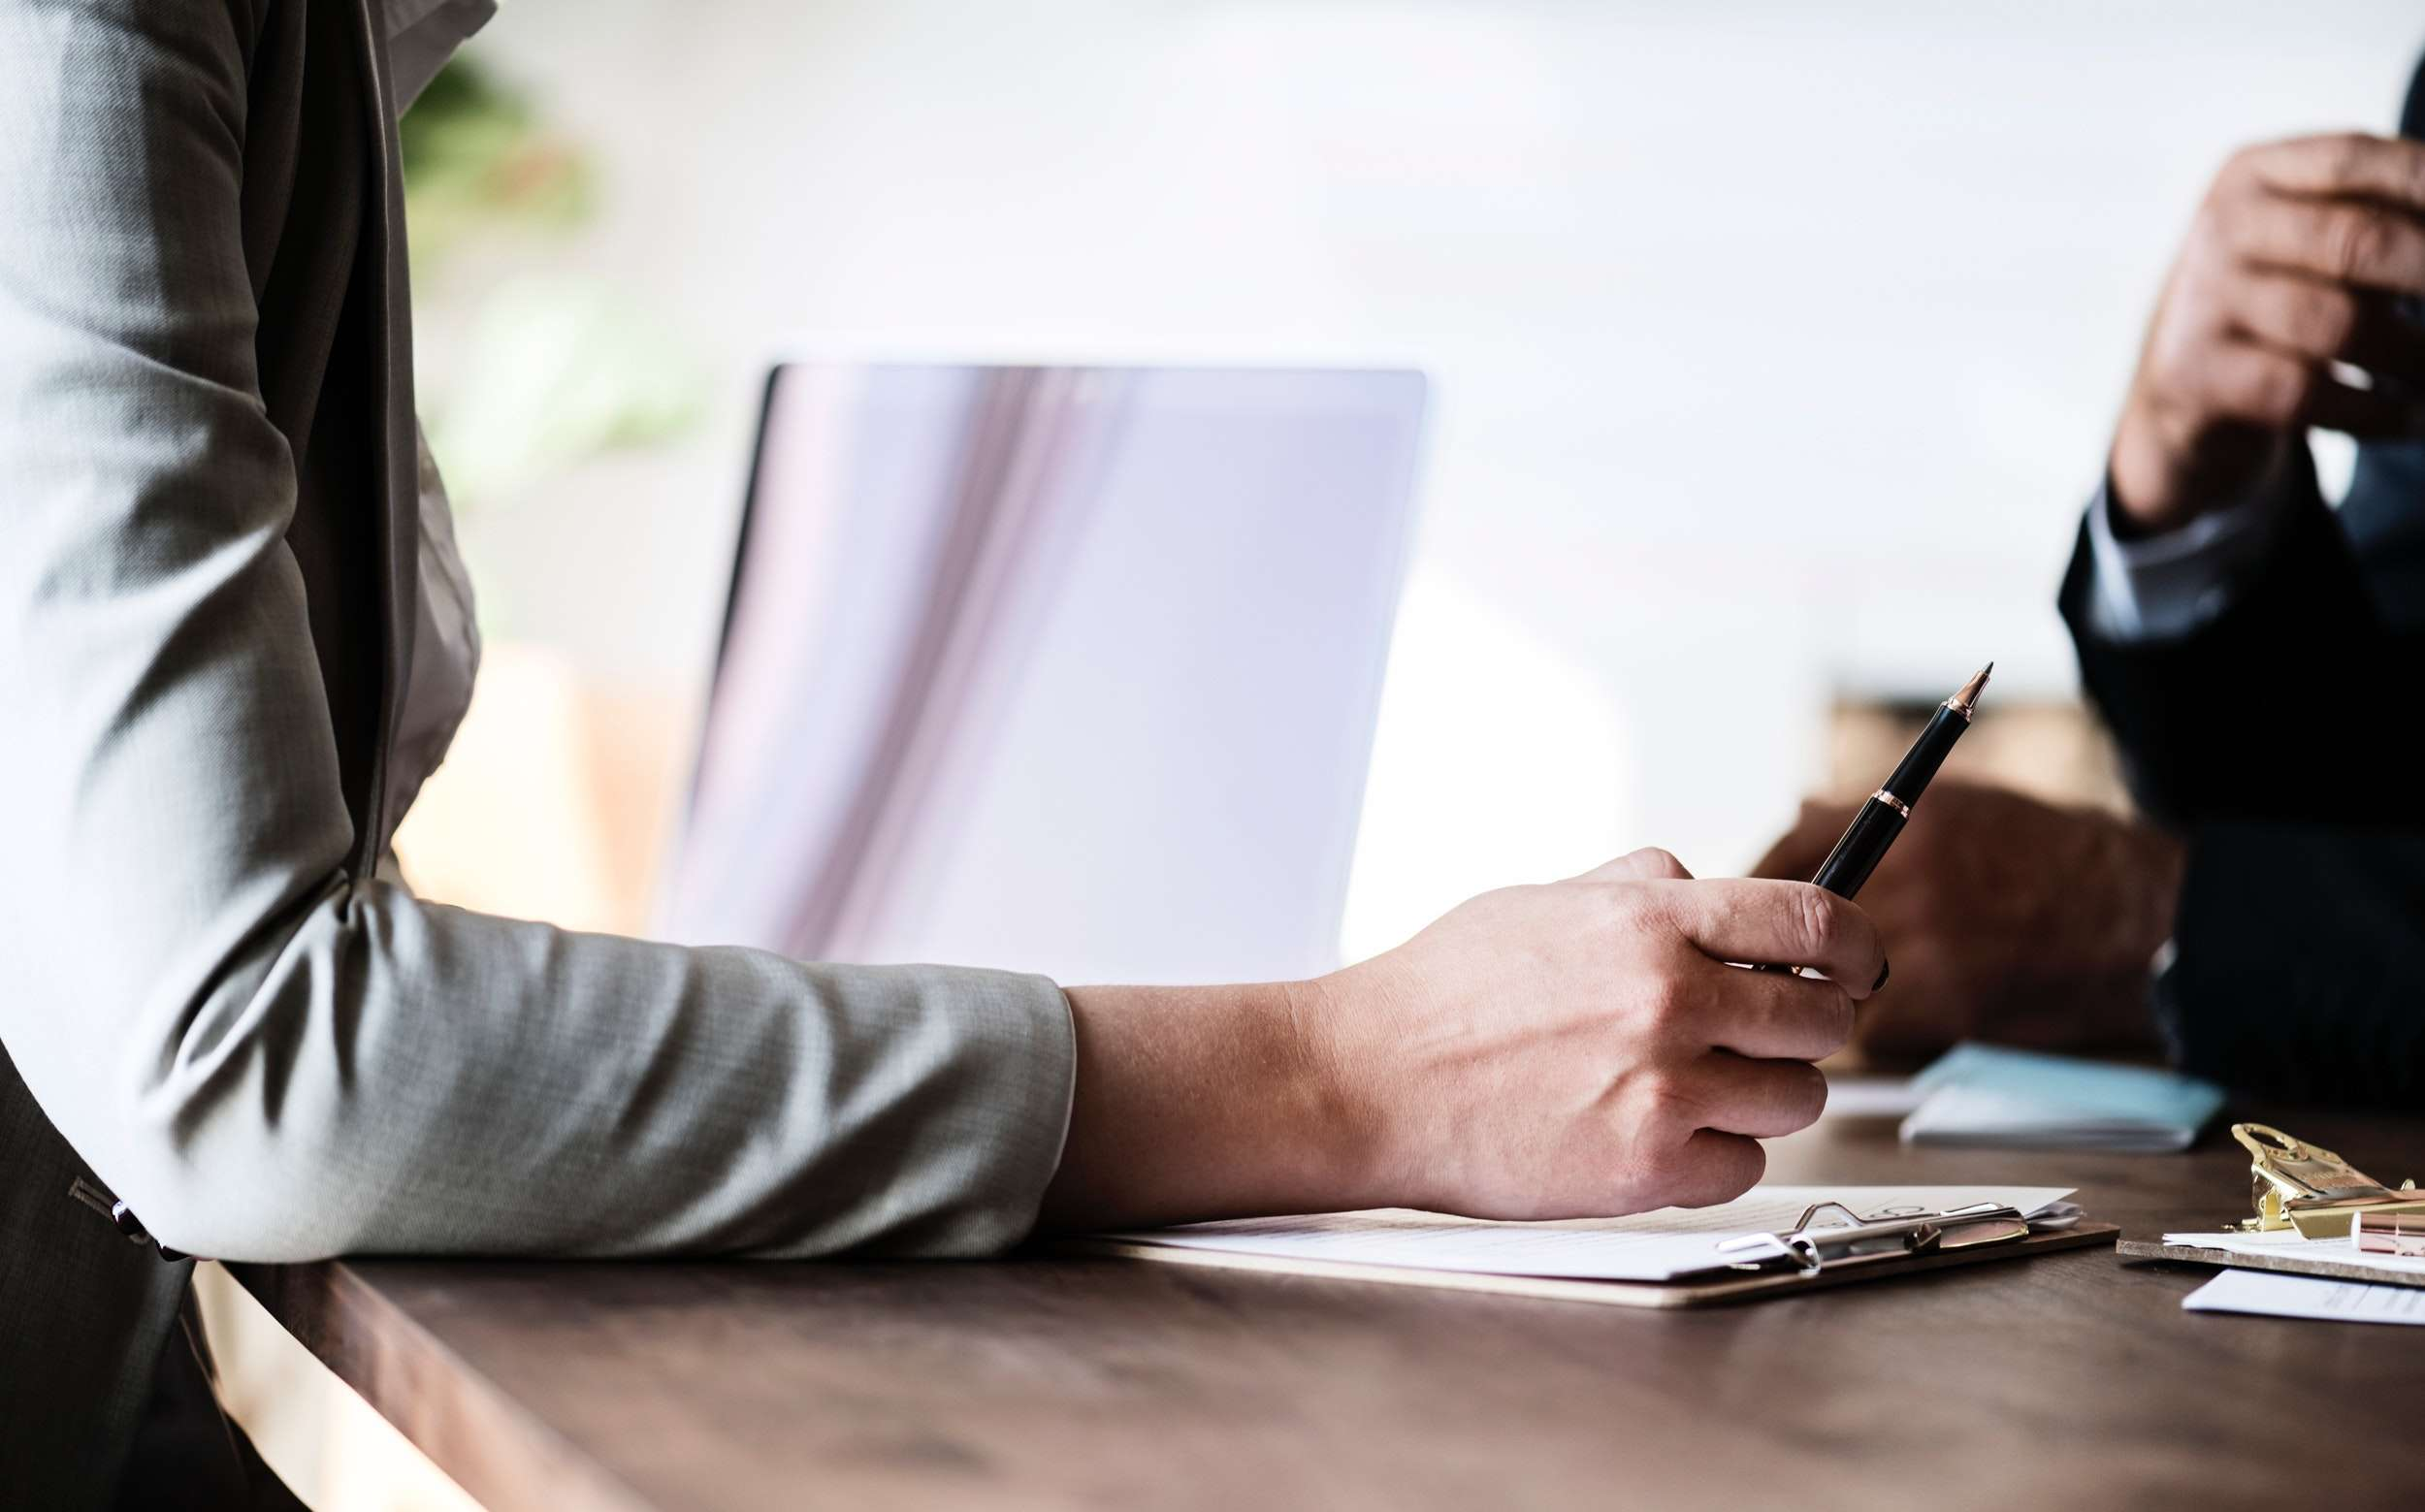 Succesvolle verkopers | Verkoopsucces ondernemers